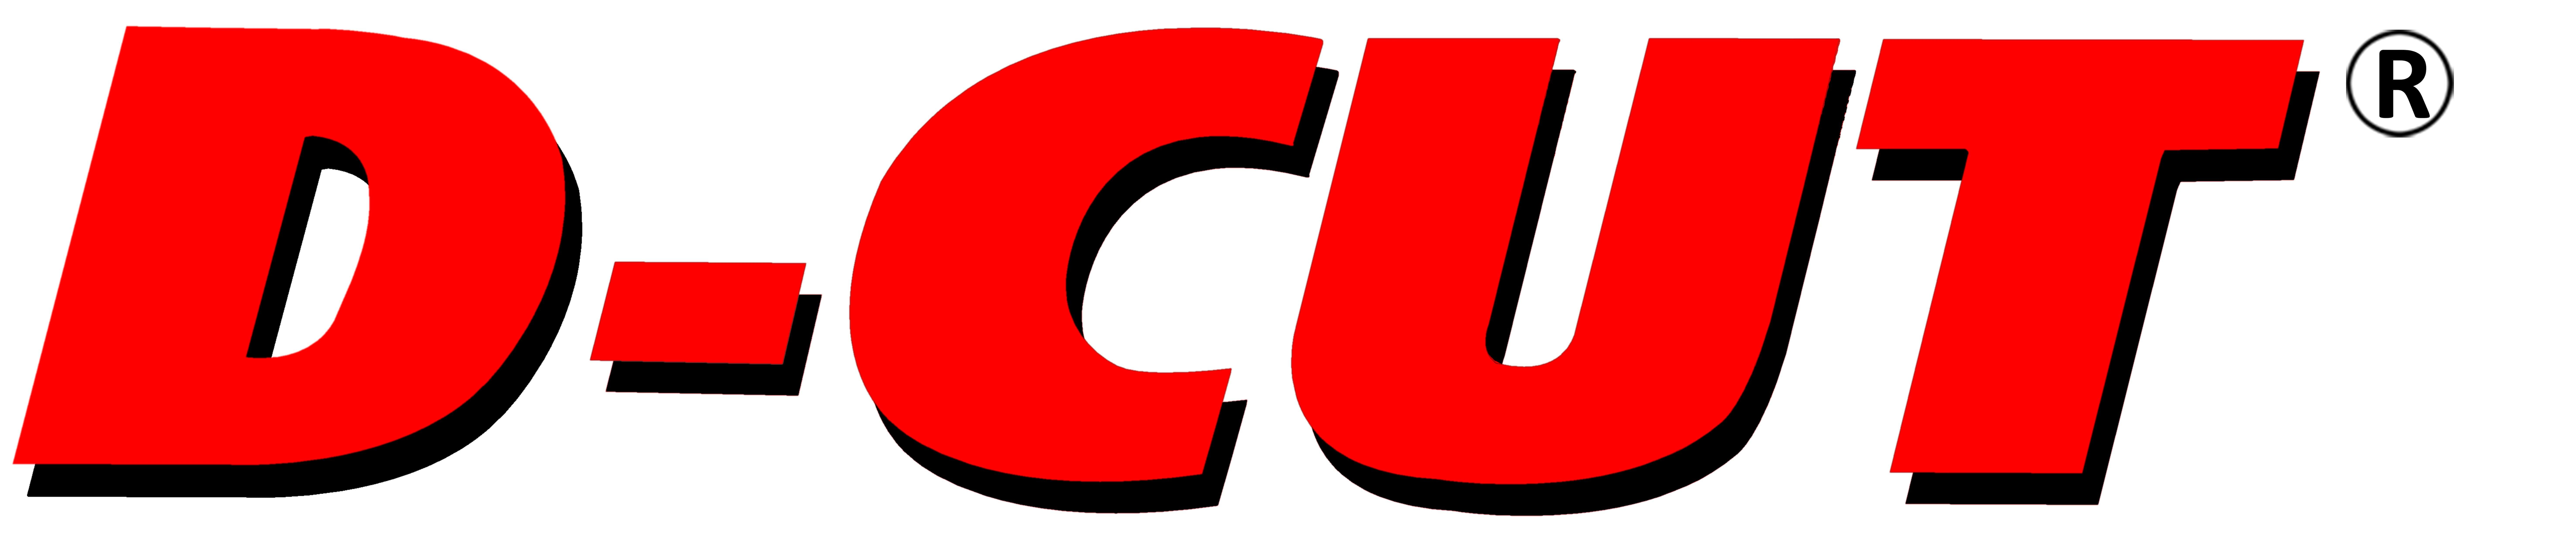 https://cfiinstallers.org/wp-content/uploads/2019/04/DCUT-Logo.jpg